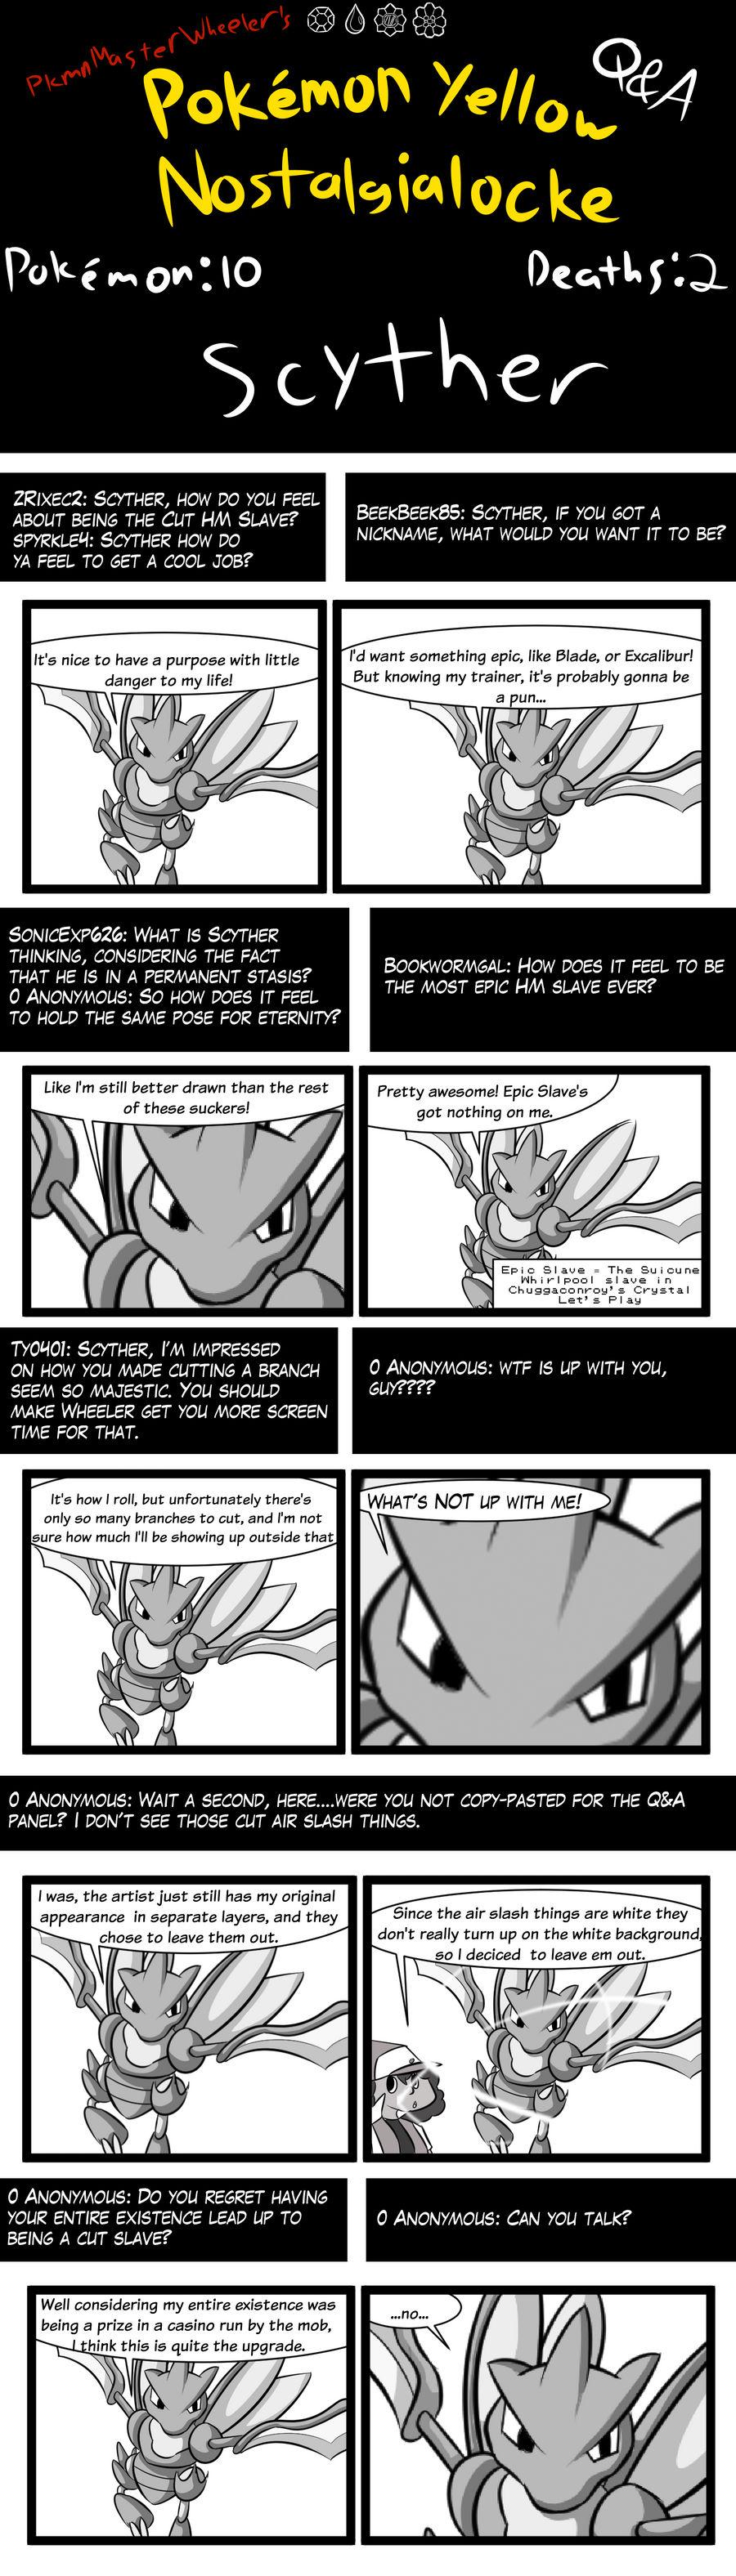 Pokemon Yellow Nostalgialocke QA Scyther by pkmnMasterWheeler